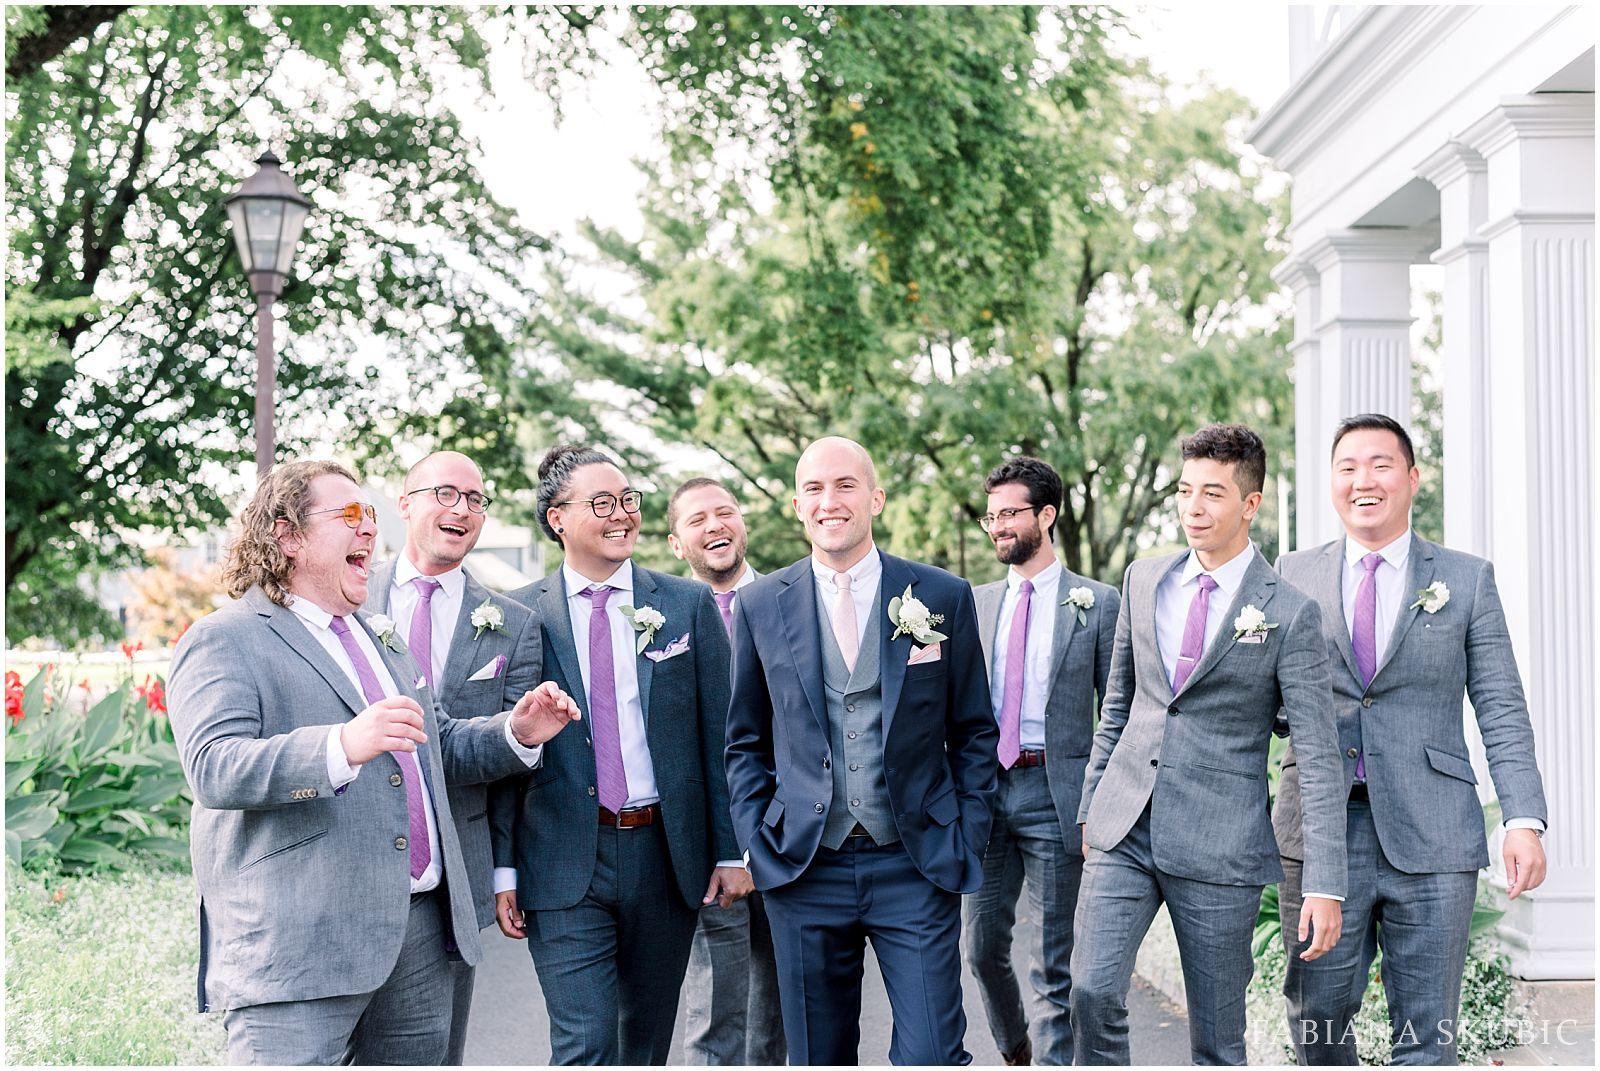 FabianaSkubic_H&M_Wedding_0041.jpg